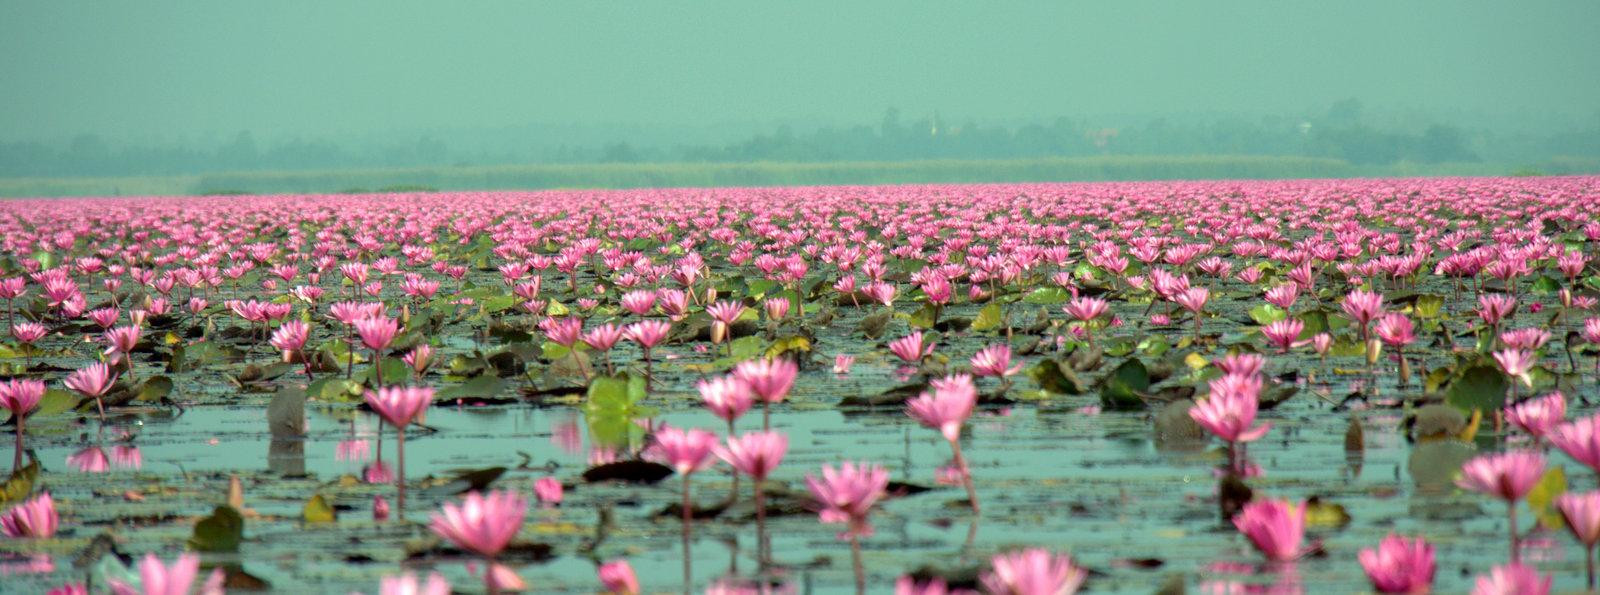 Kumphawapi Thailand  city pictures gallery : Lotus Lake Boat Trip Nong Han Kumphawapi